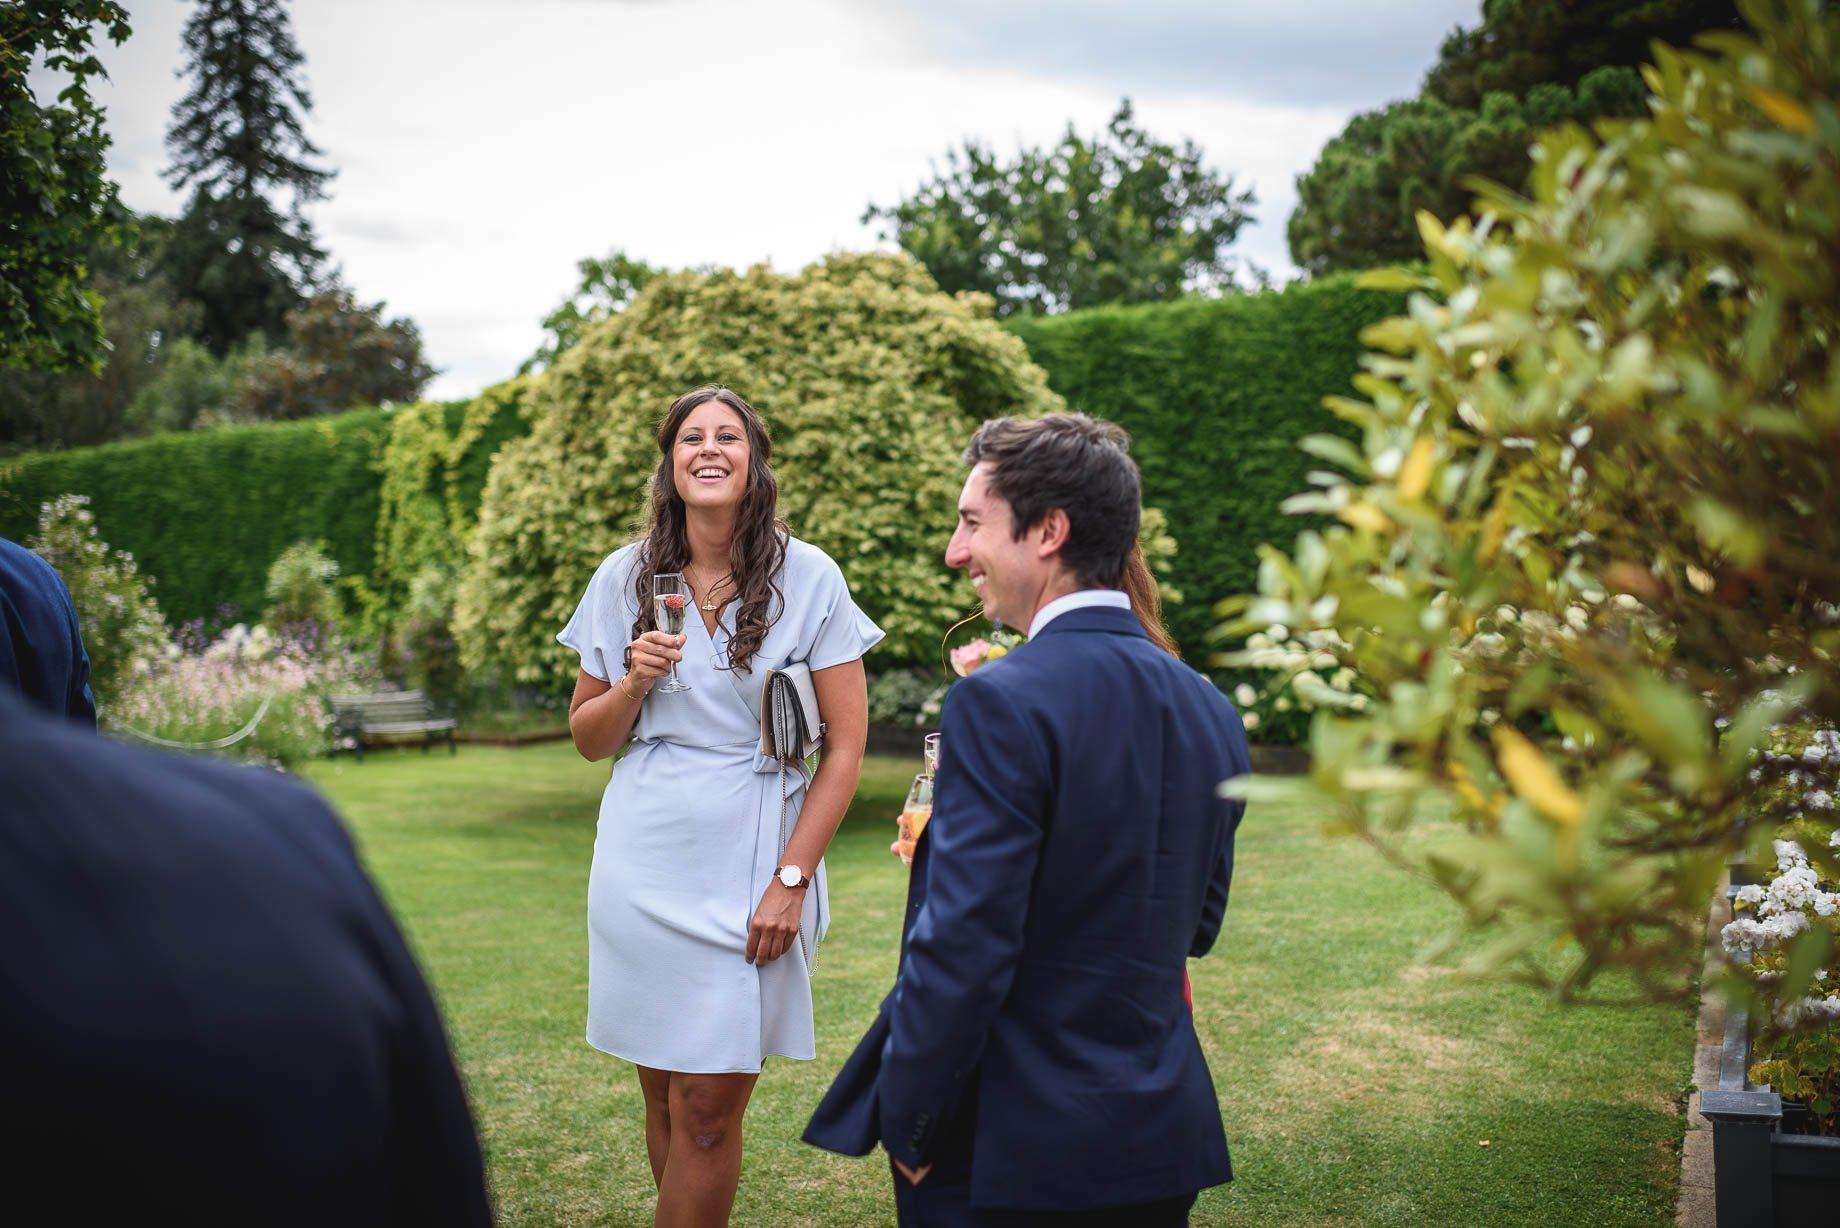 Gaynes Park wedding photography - Guy Collier Photography - Rachel and Jon (81 of 169)